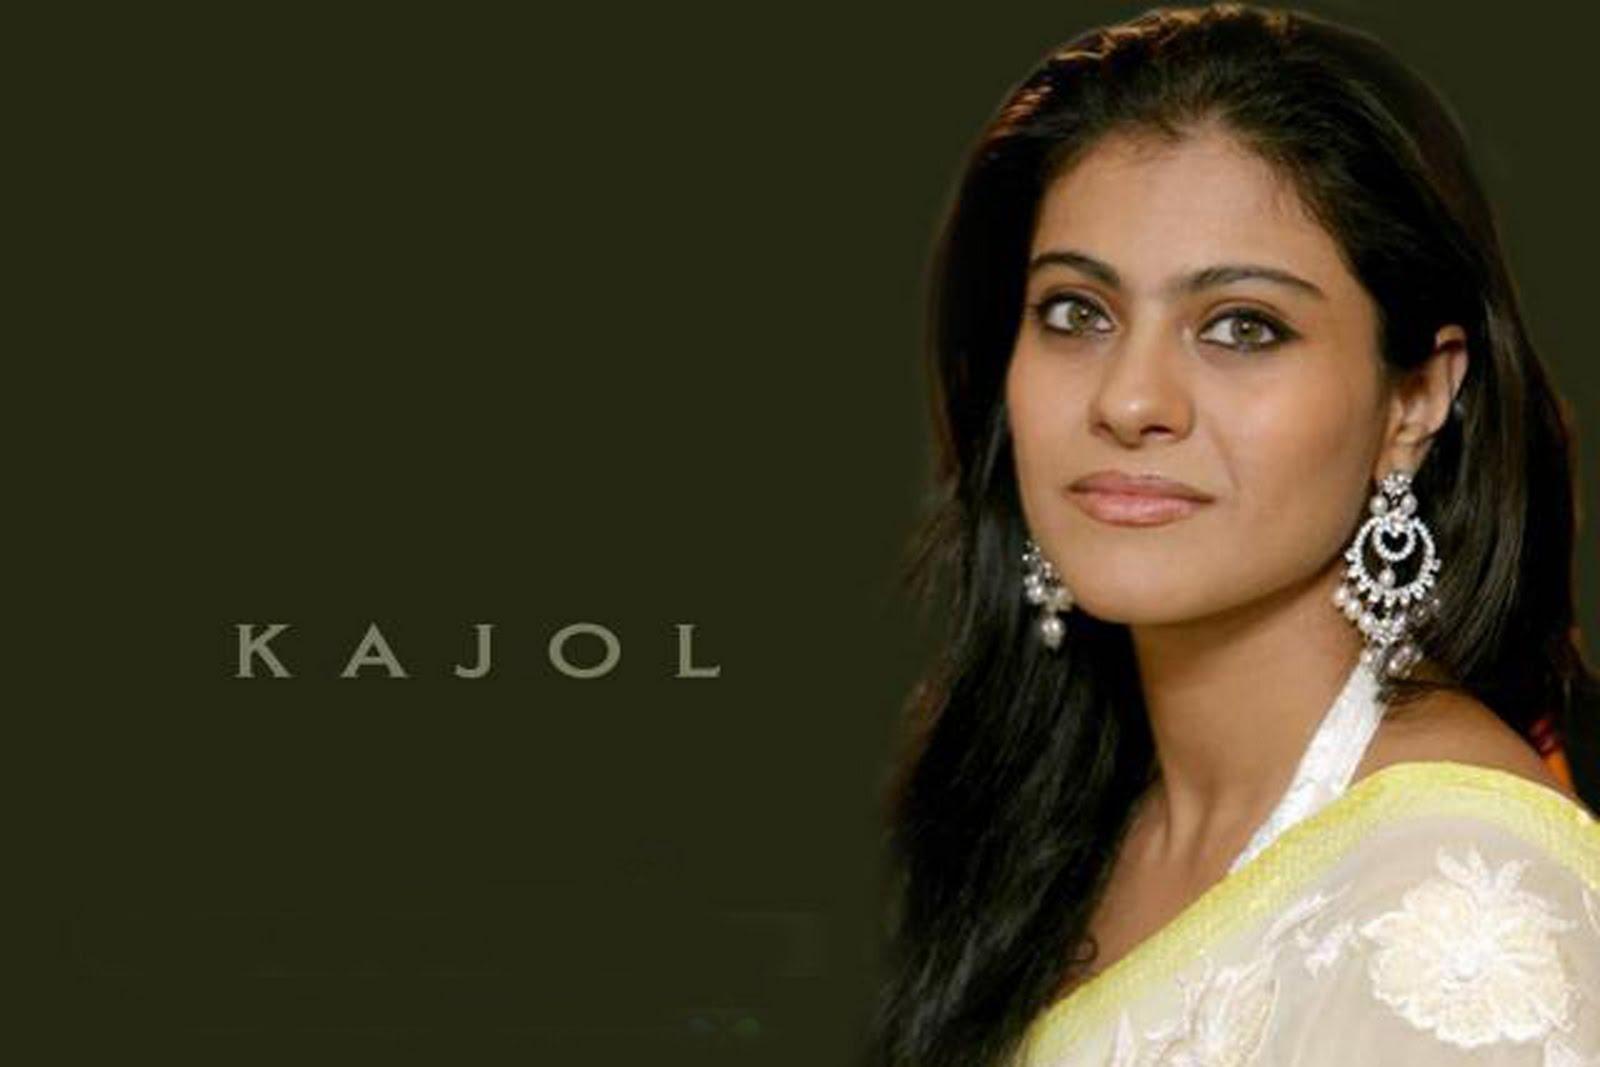 Kajol Bollywood Actress Hot Wallpapers 1600x1067